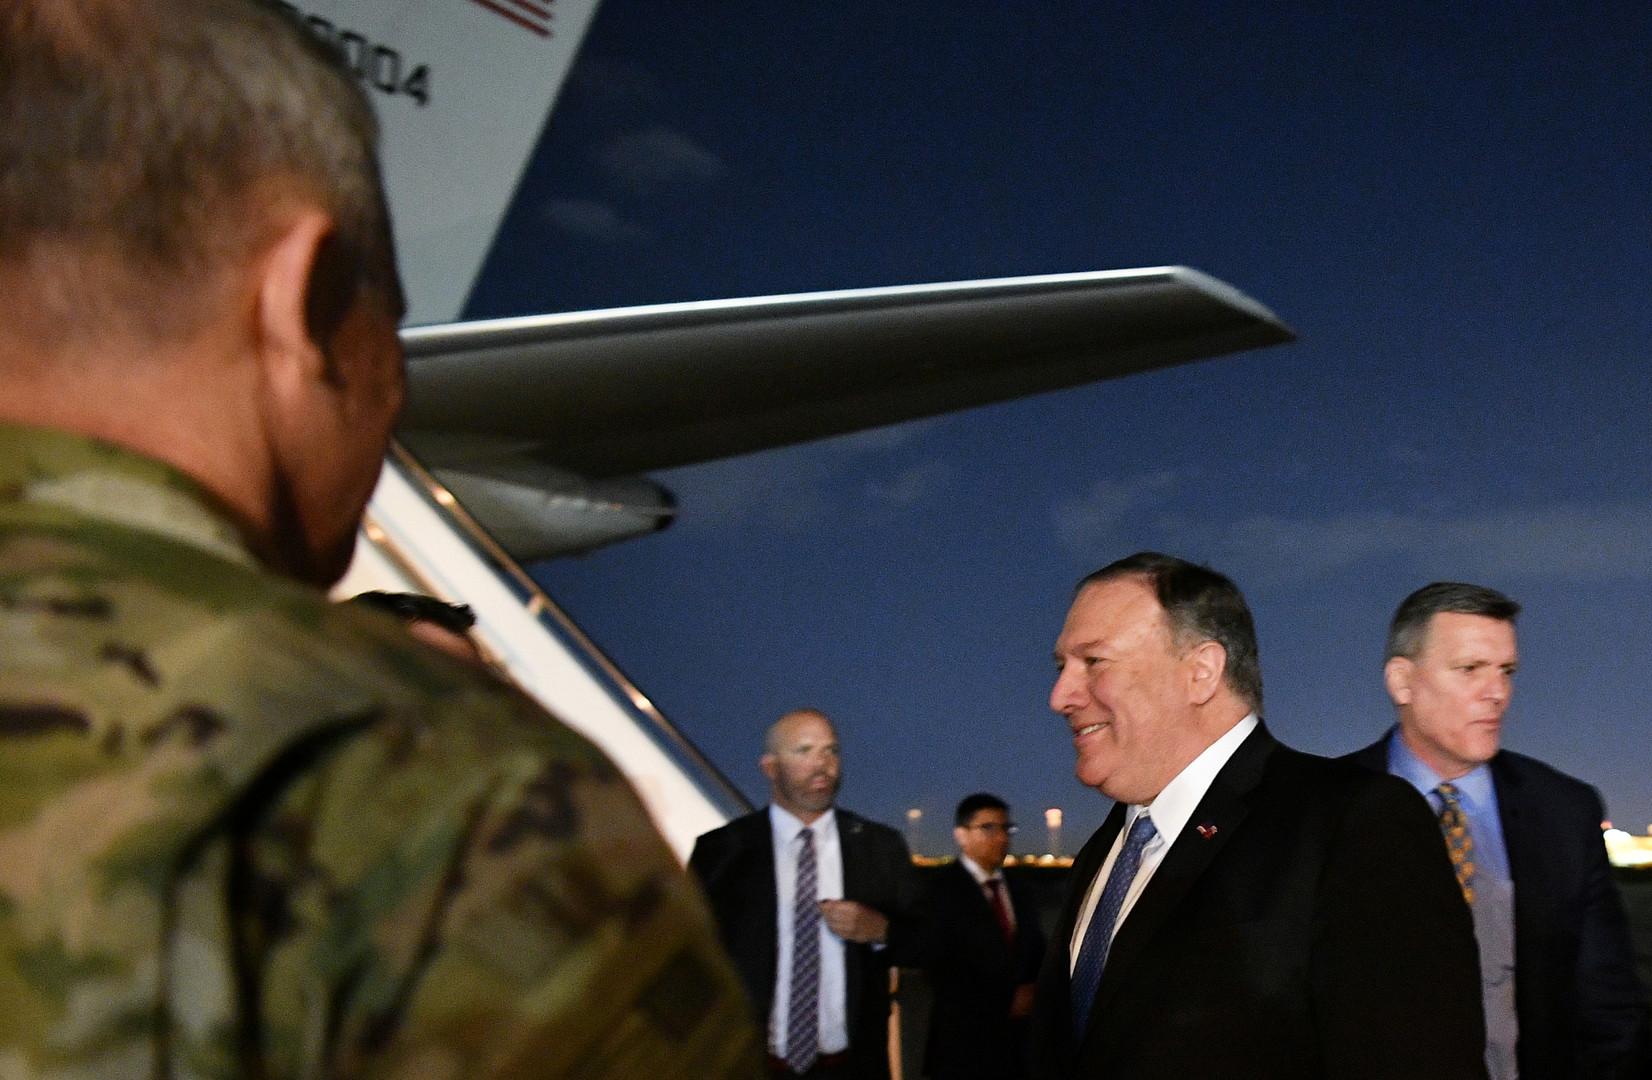 مسؤولون عراقيون: بومبيو نقل لبغداد تحذيرا صارما بشأن